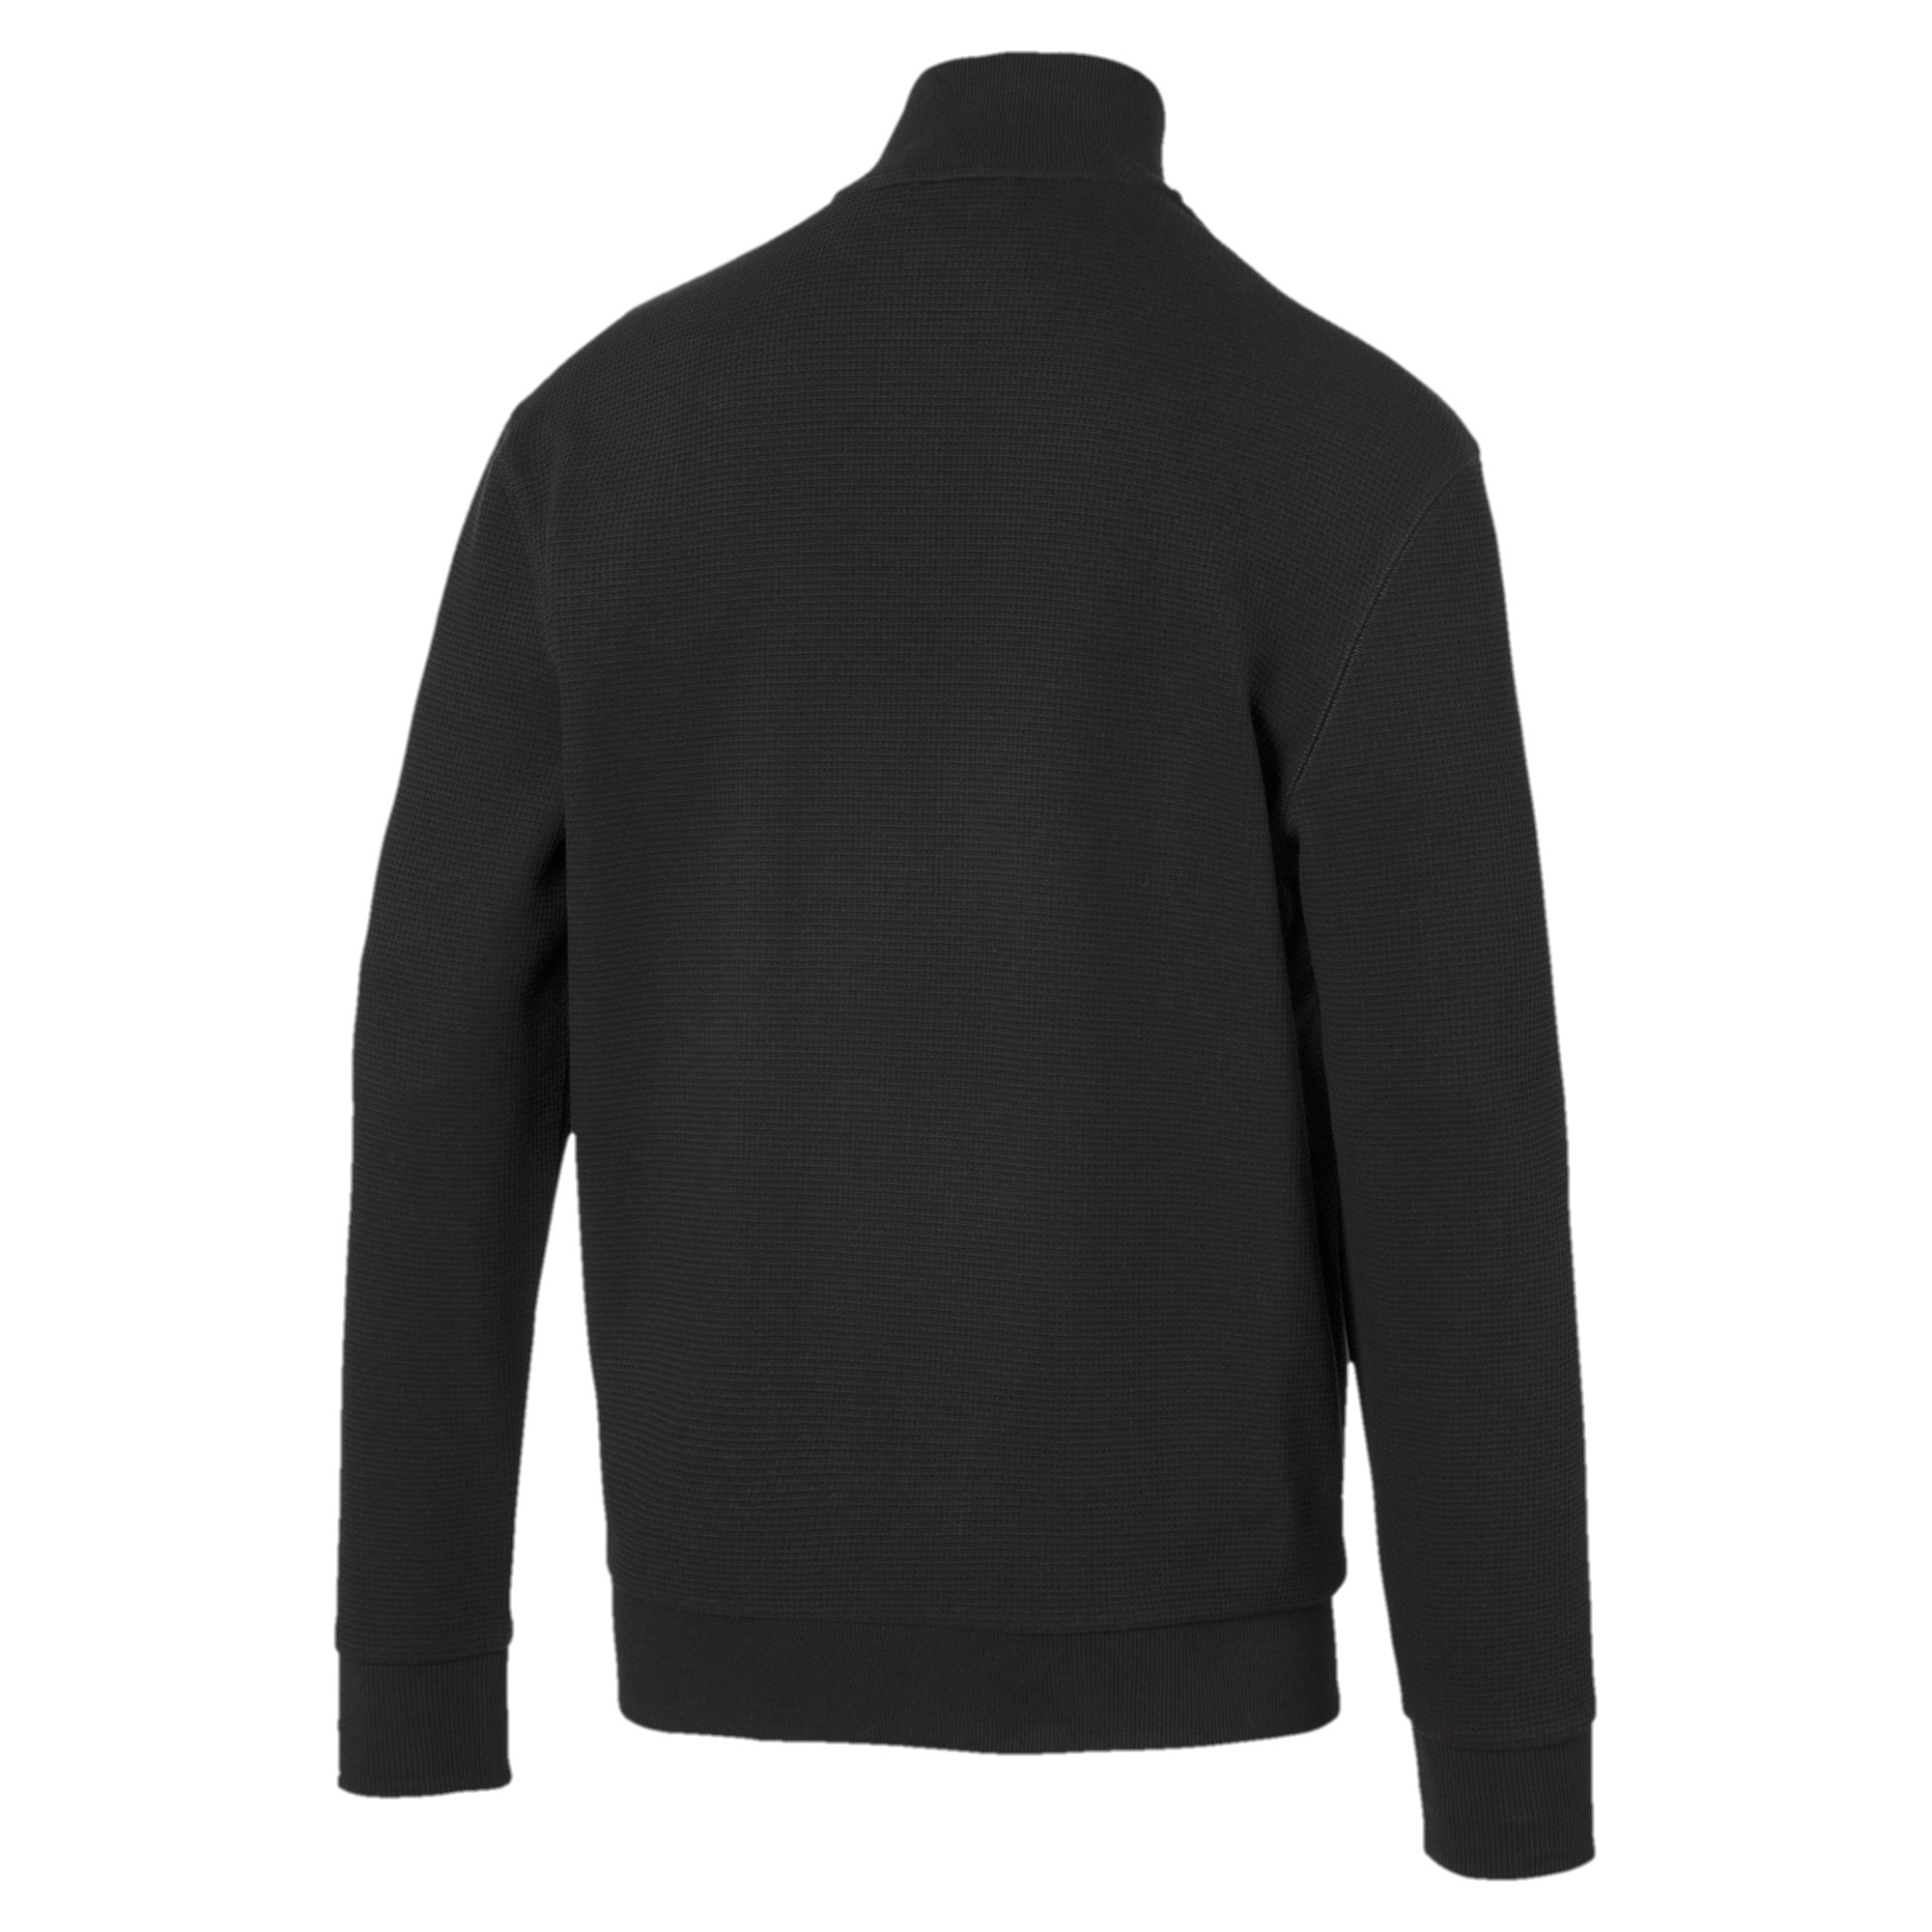 PUMA-Fusion-Men-039-s-Jacket-Men-Sweat-Basics thumbnail 3